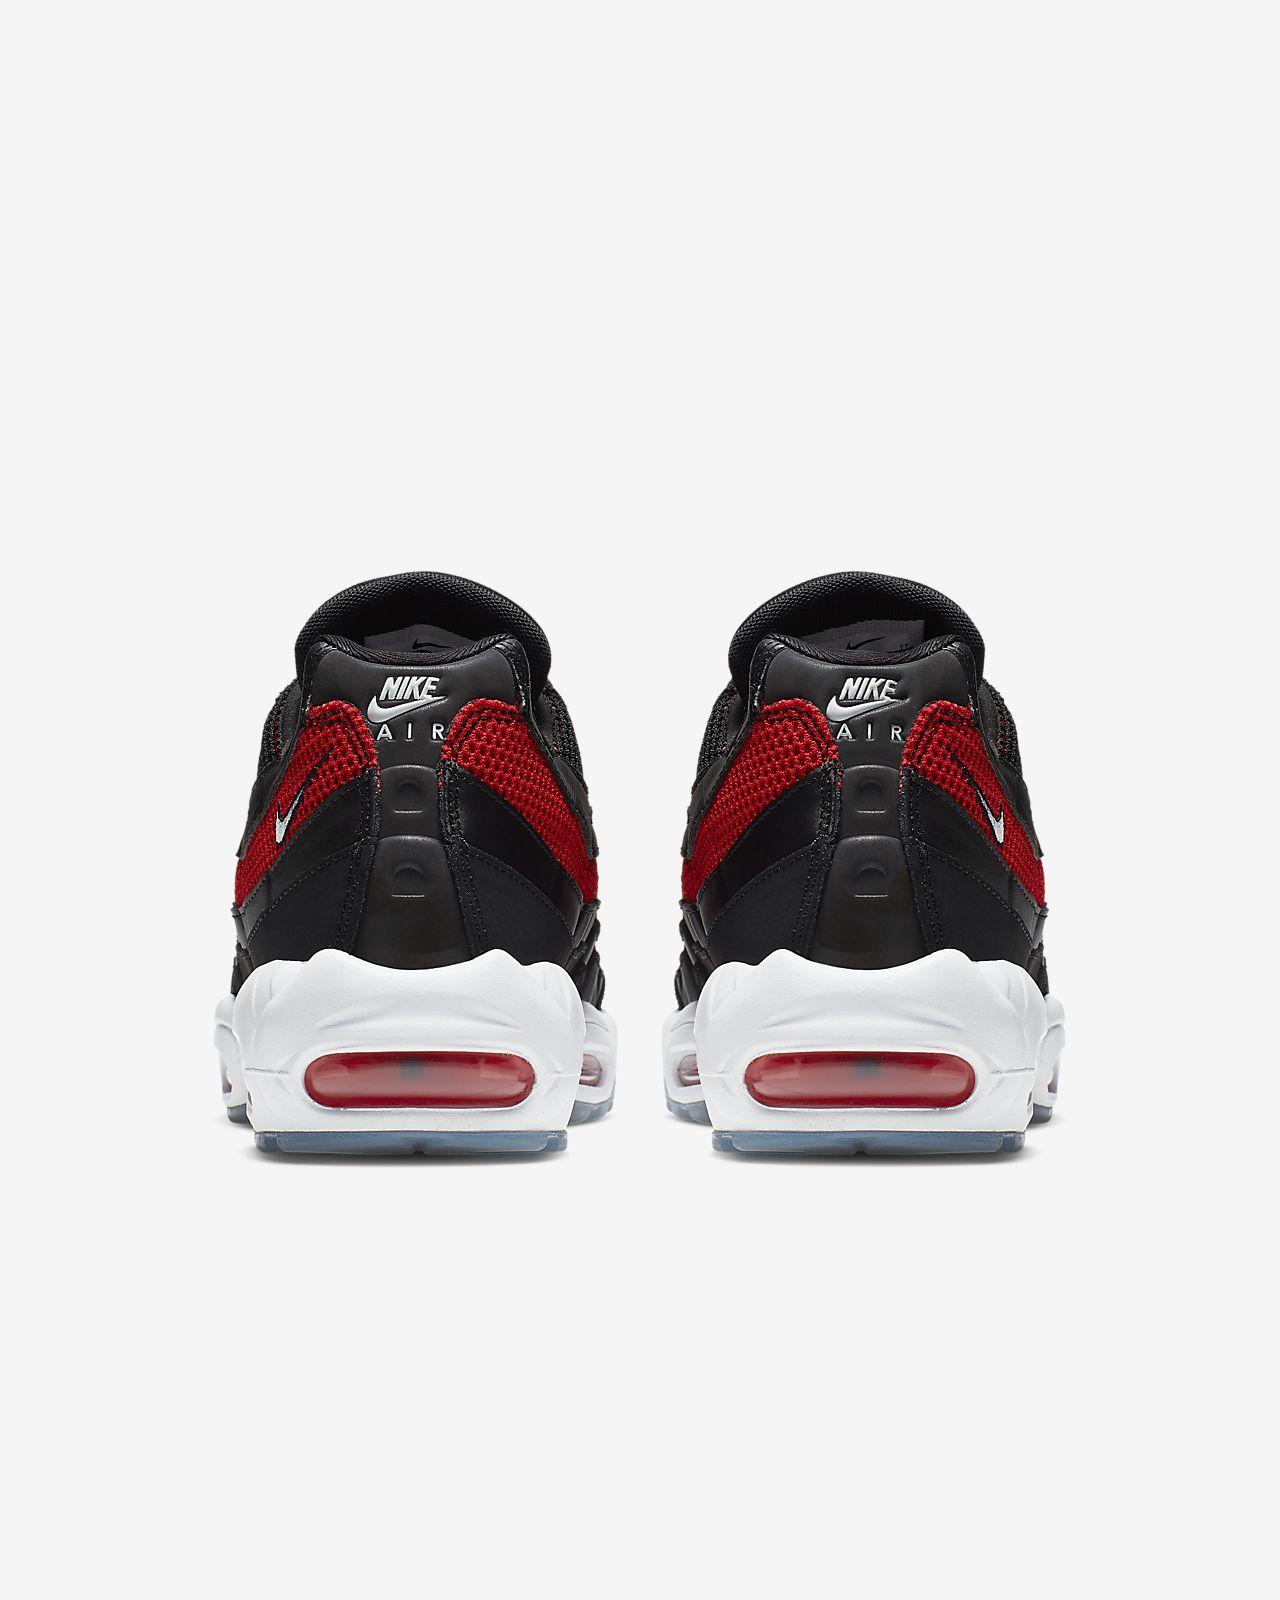 wholesale dealer 2af3b c6e46 ... Chaussure Nike Air Max 95 Essential pour Homme